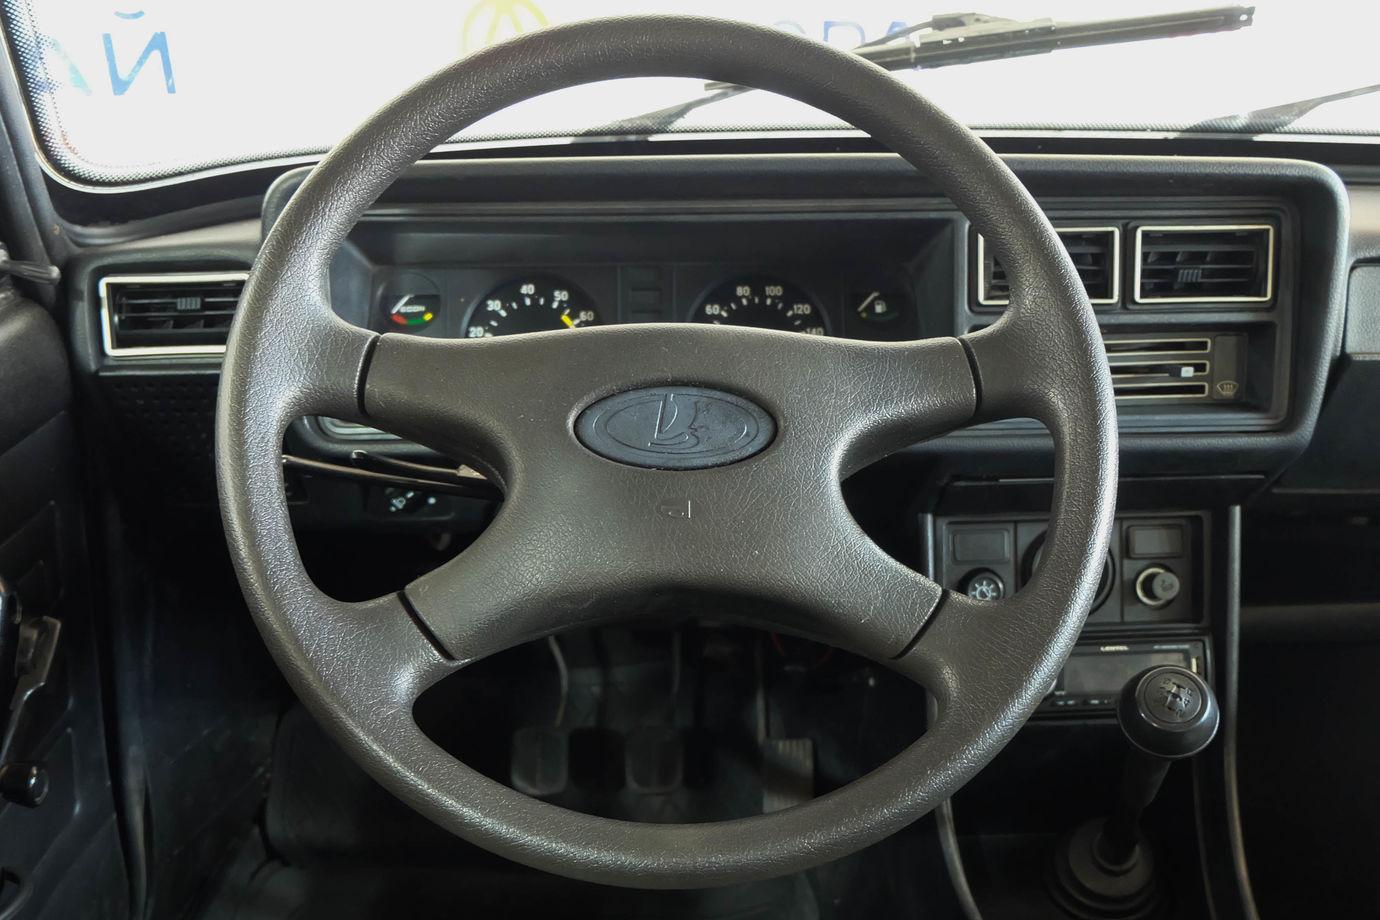 LADA (ВАЗ) 2107, 2107 2011г.